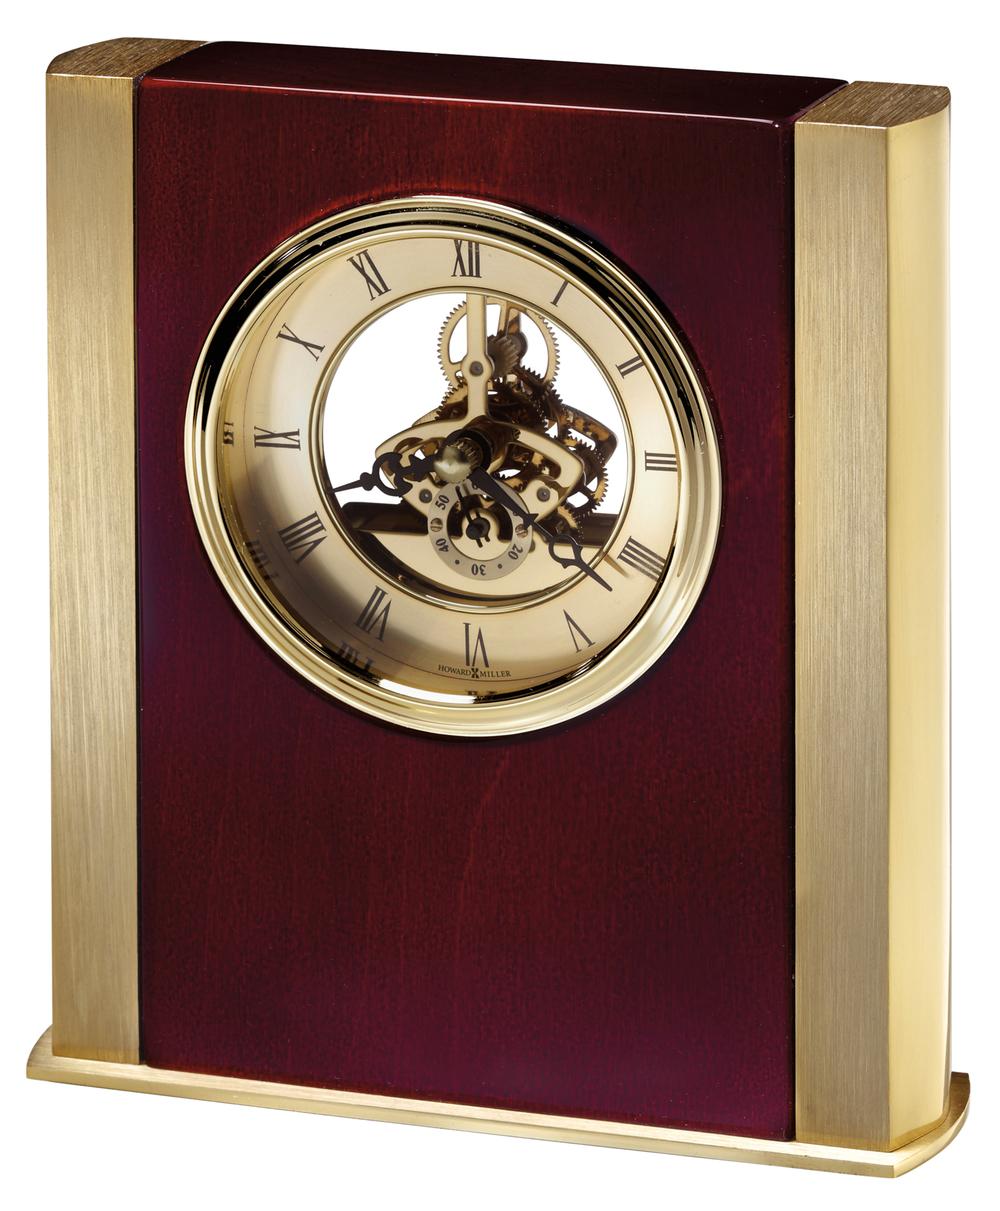 Howard Miller Clock - Essex Table Top Clock